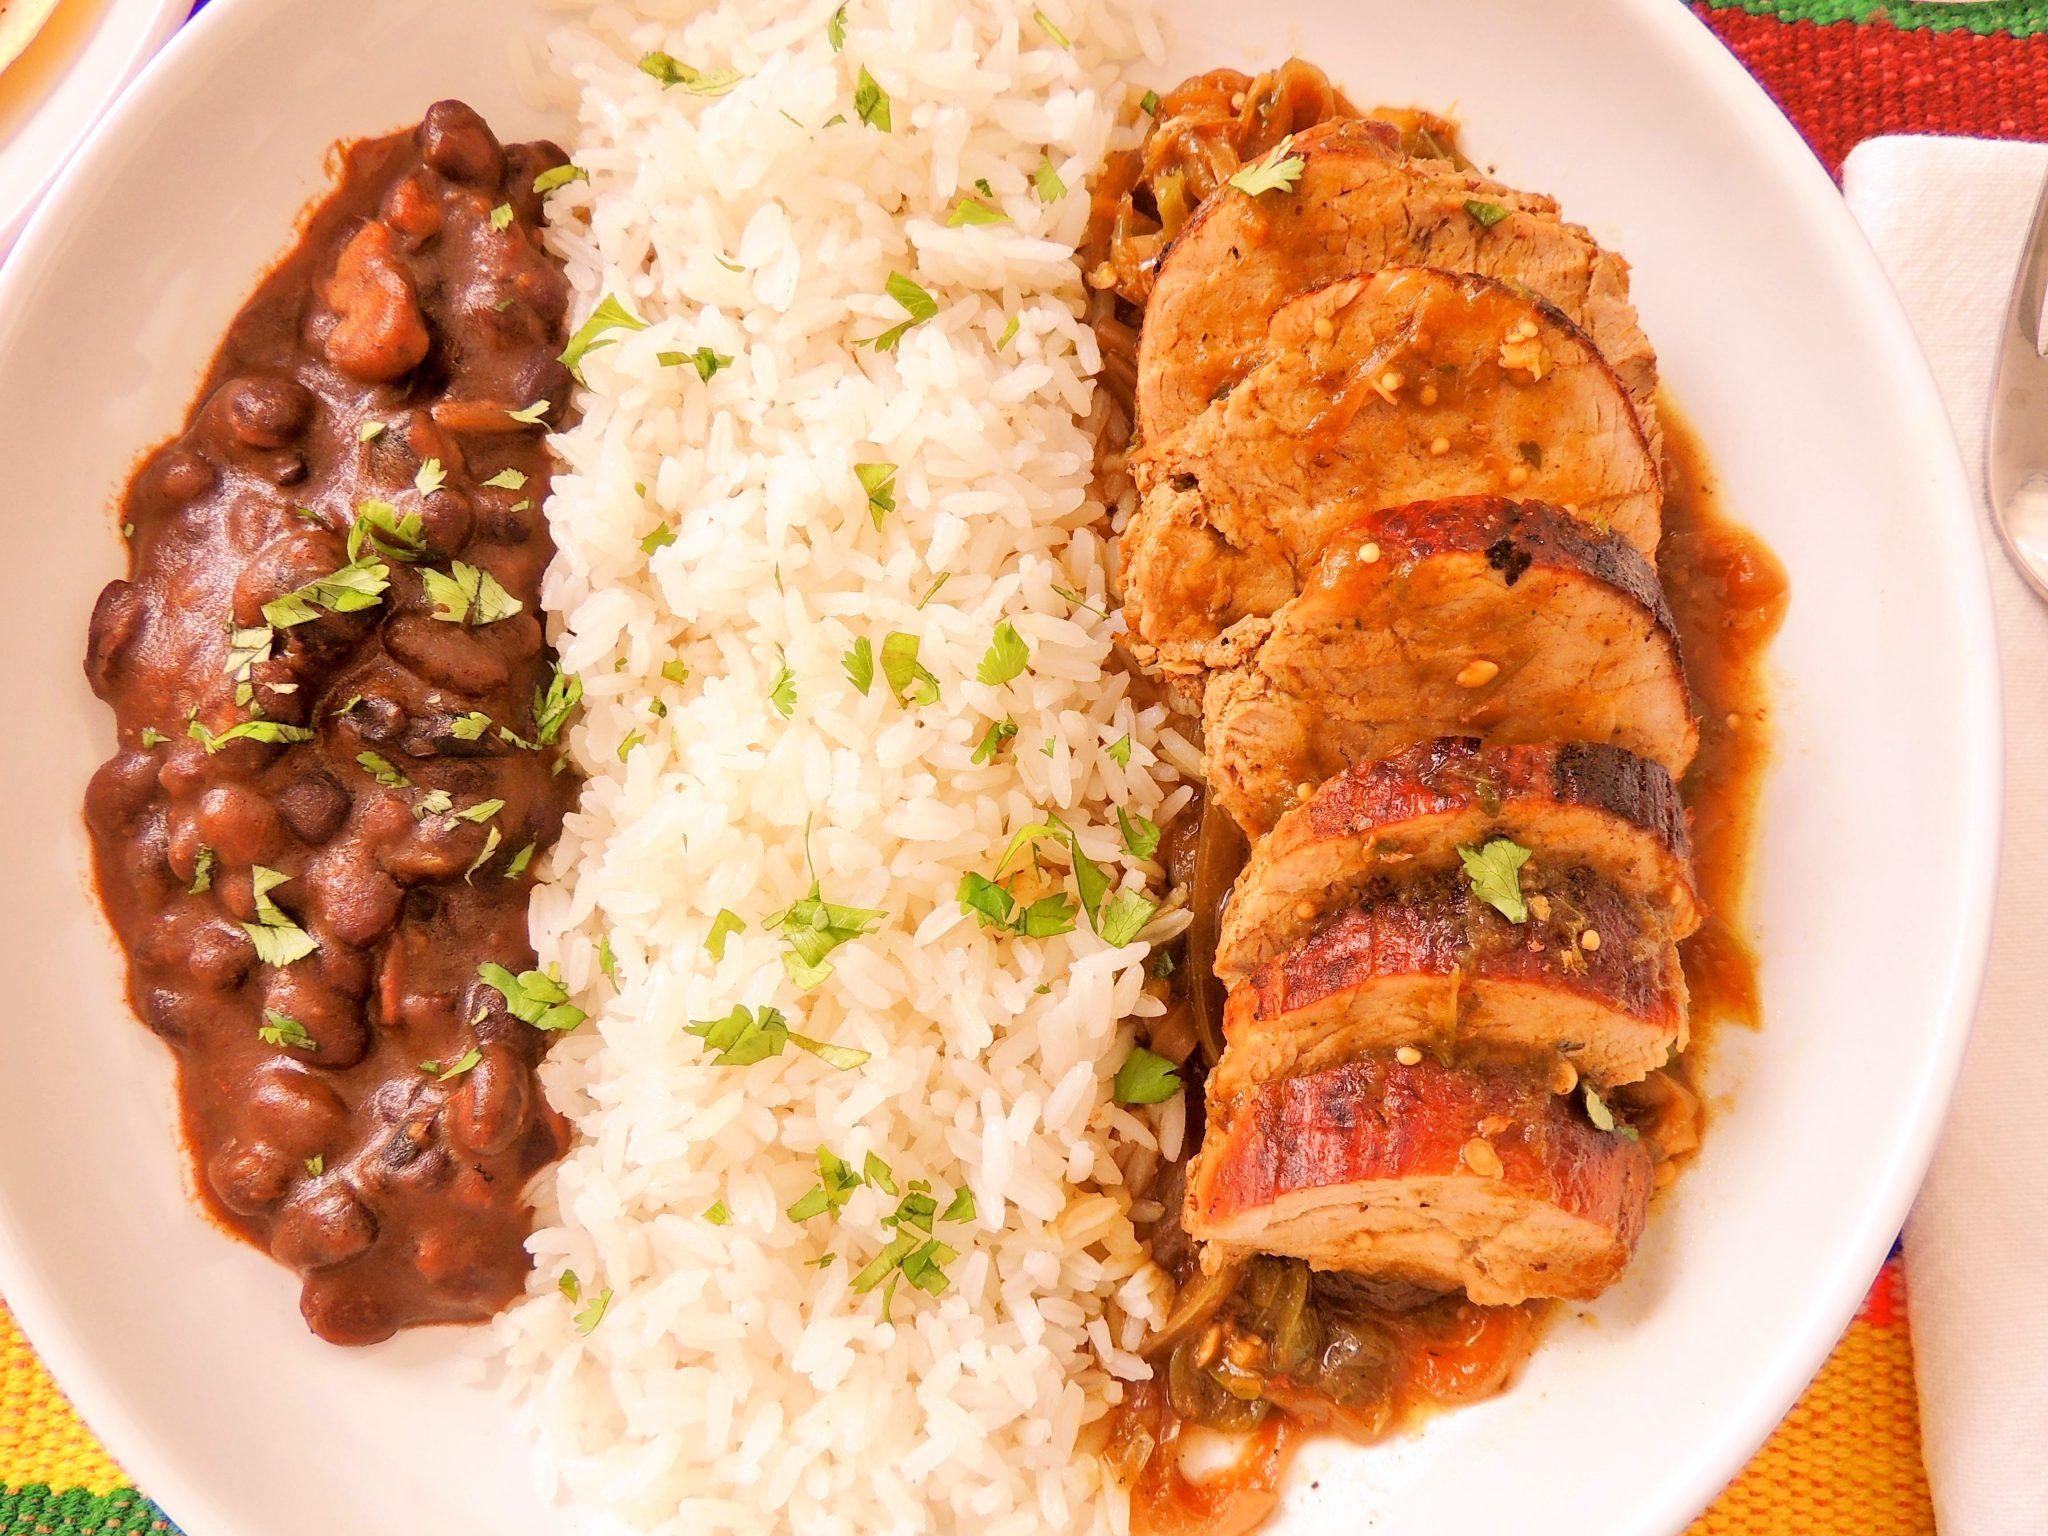 Salsa verde pork tenderloin – The Petit Gourmet